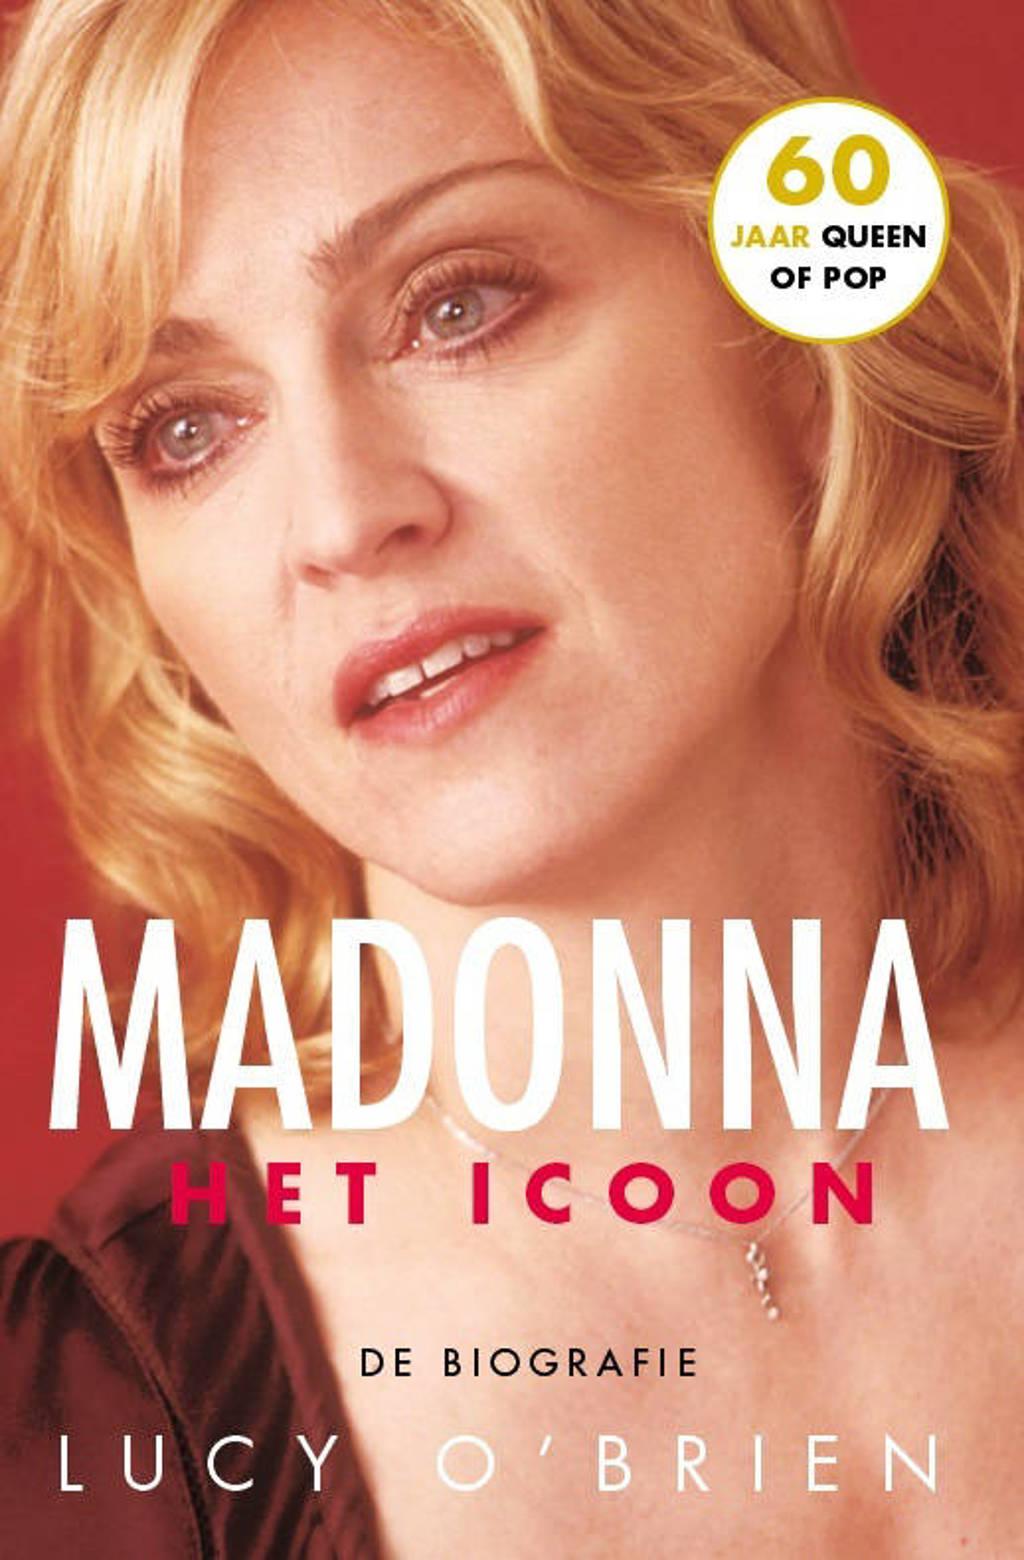 Madonna, Het icoon - Lucy O'Brien